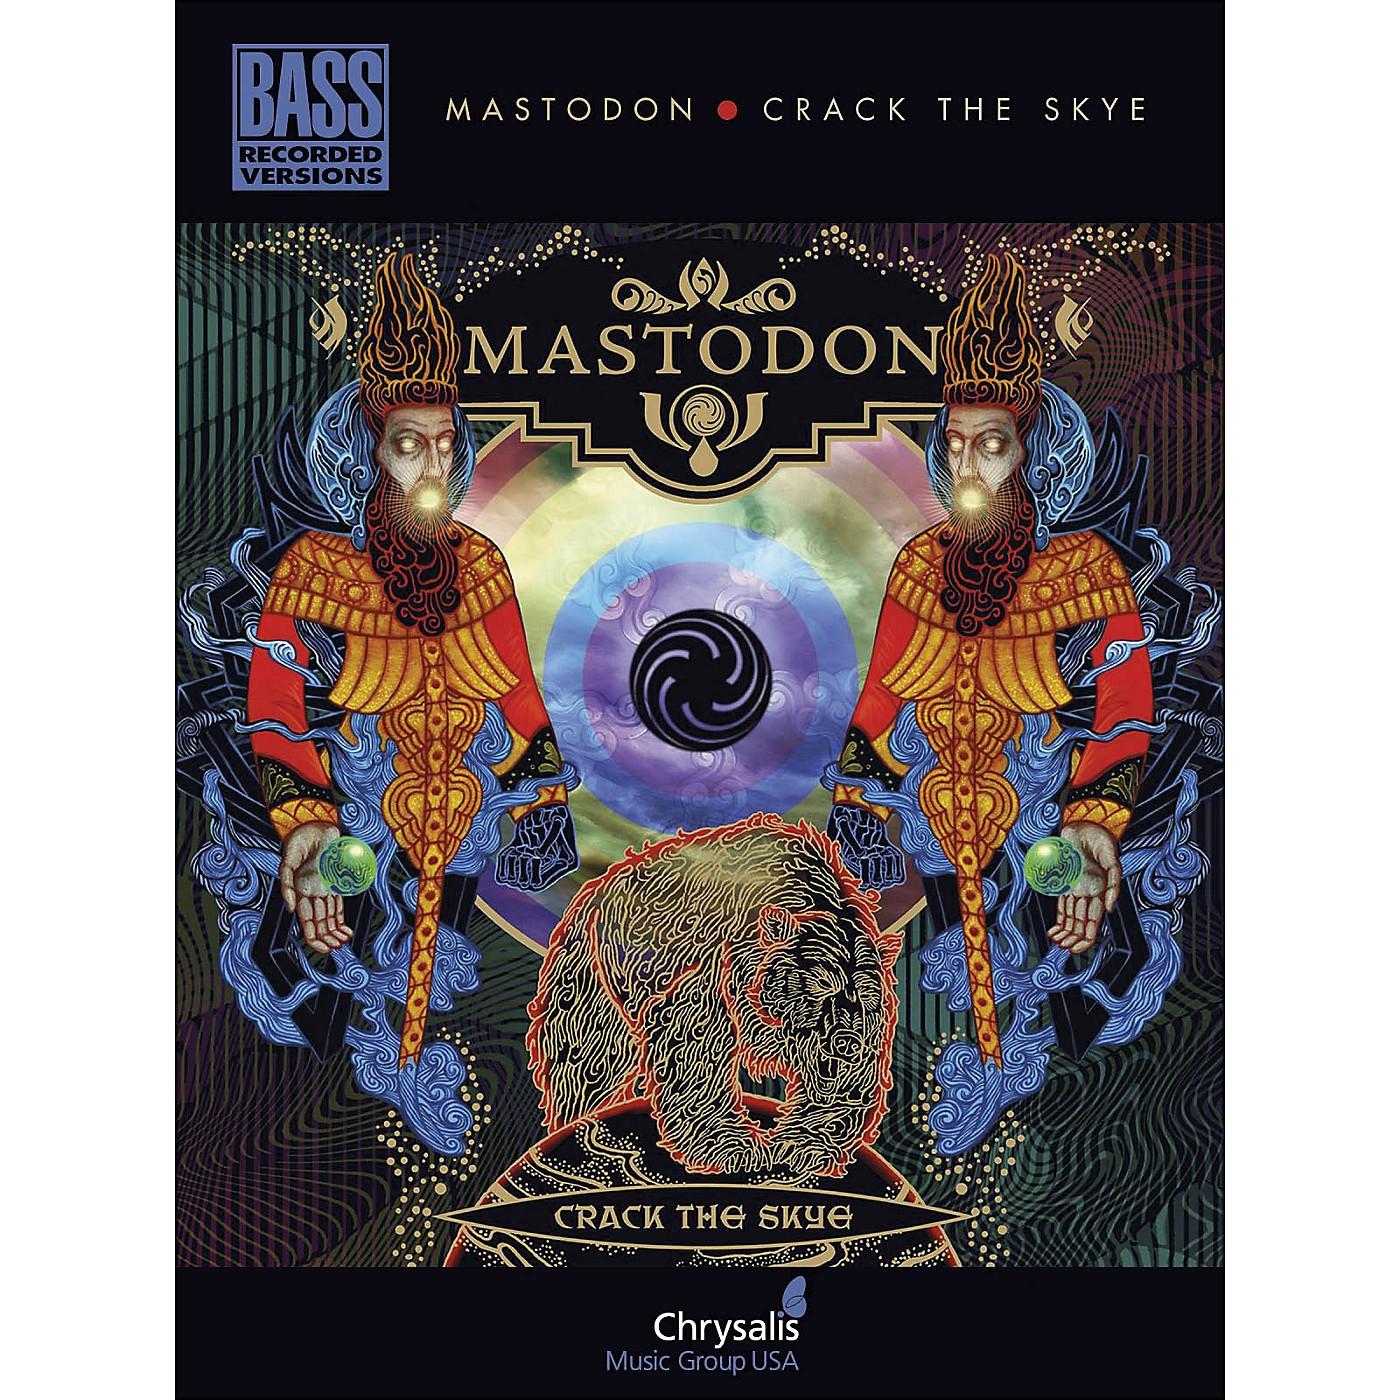 Hal Leonard Mastodon - Crack The Skye Bass Tab Songbook thumbnail